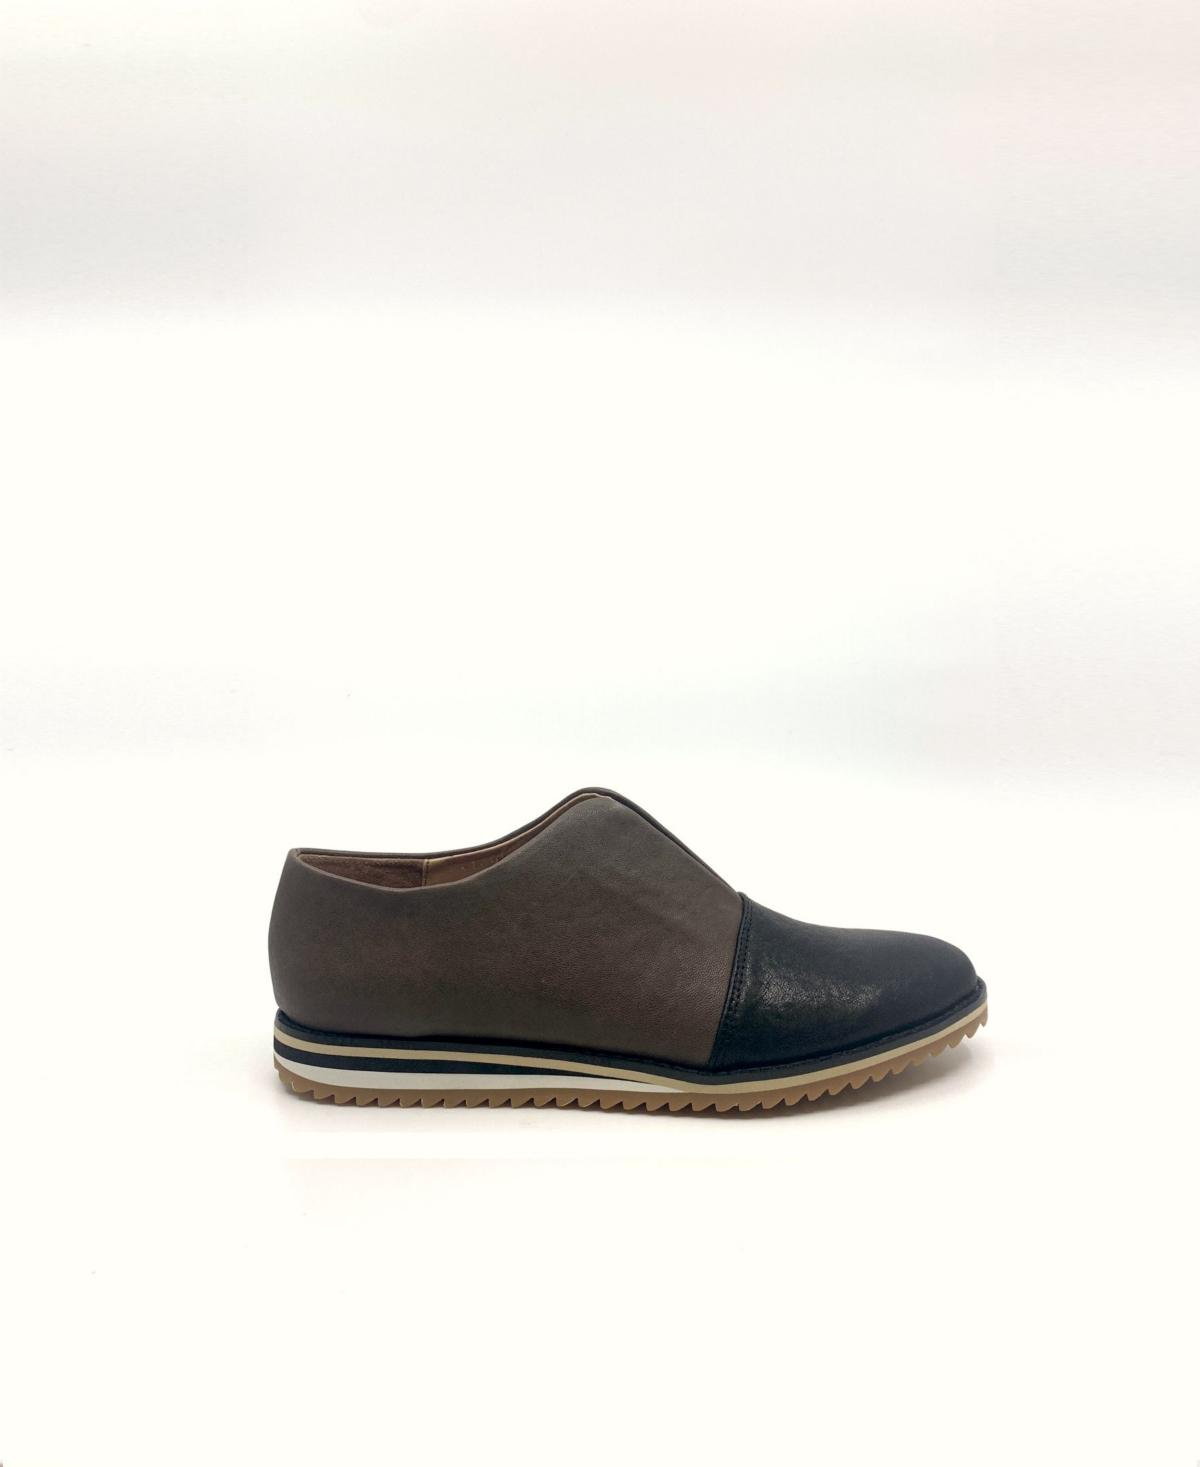 Women's Cap and Slip-On Flats Women's Shoes